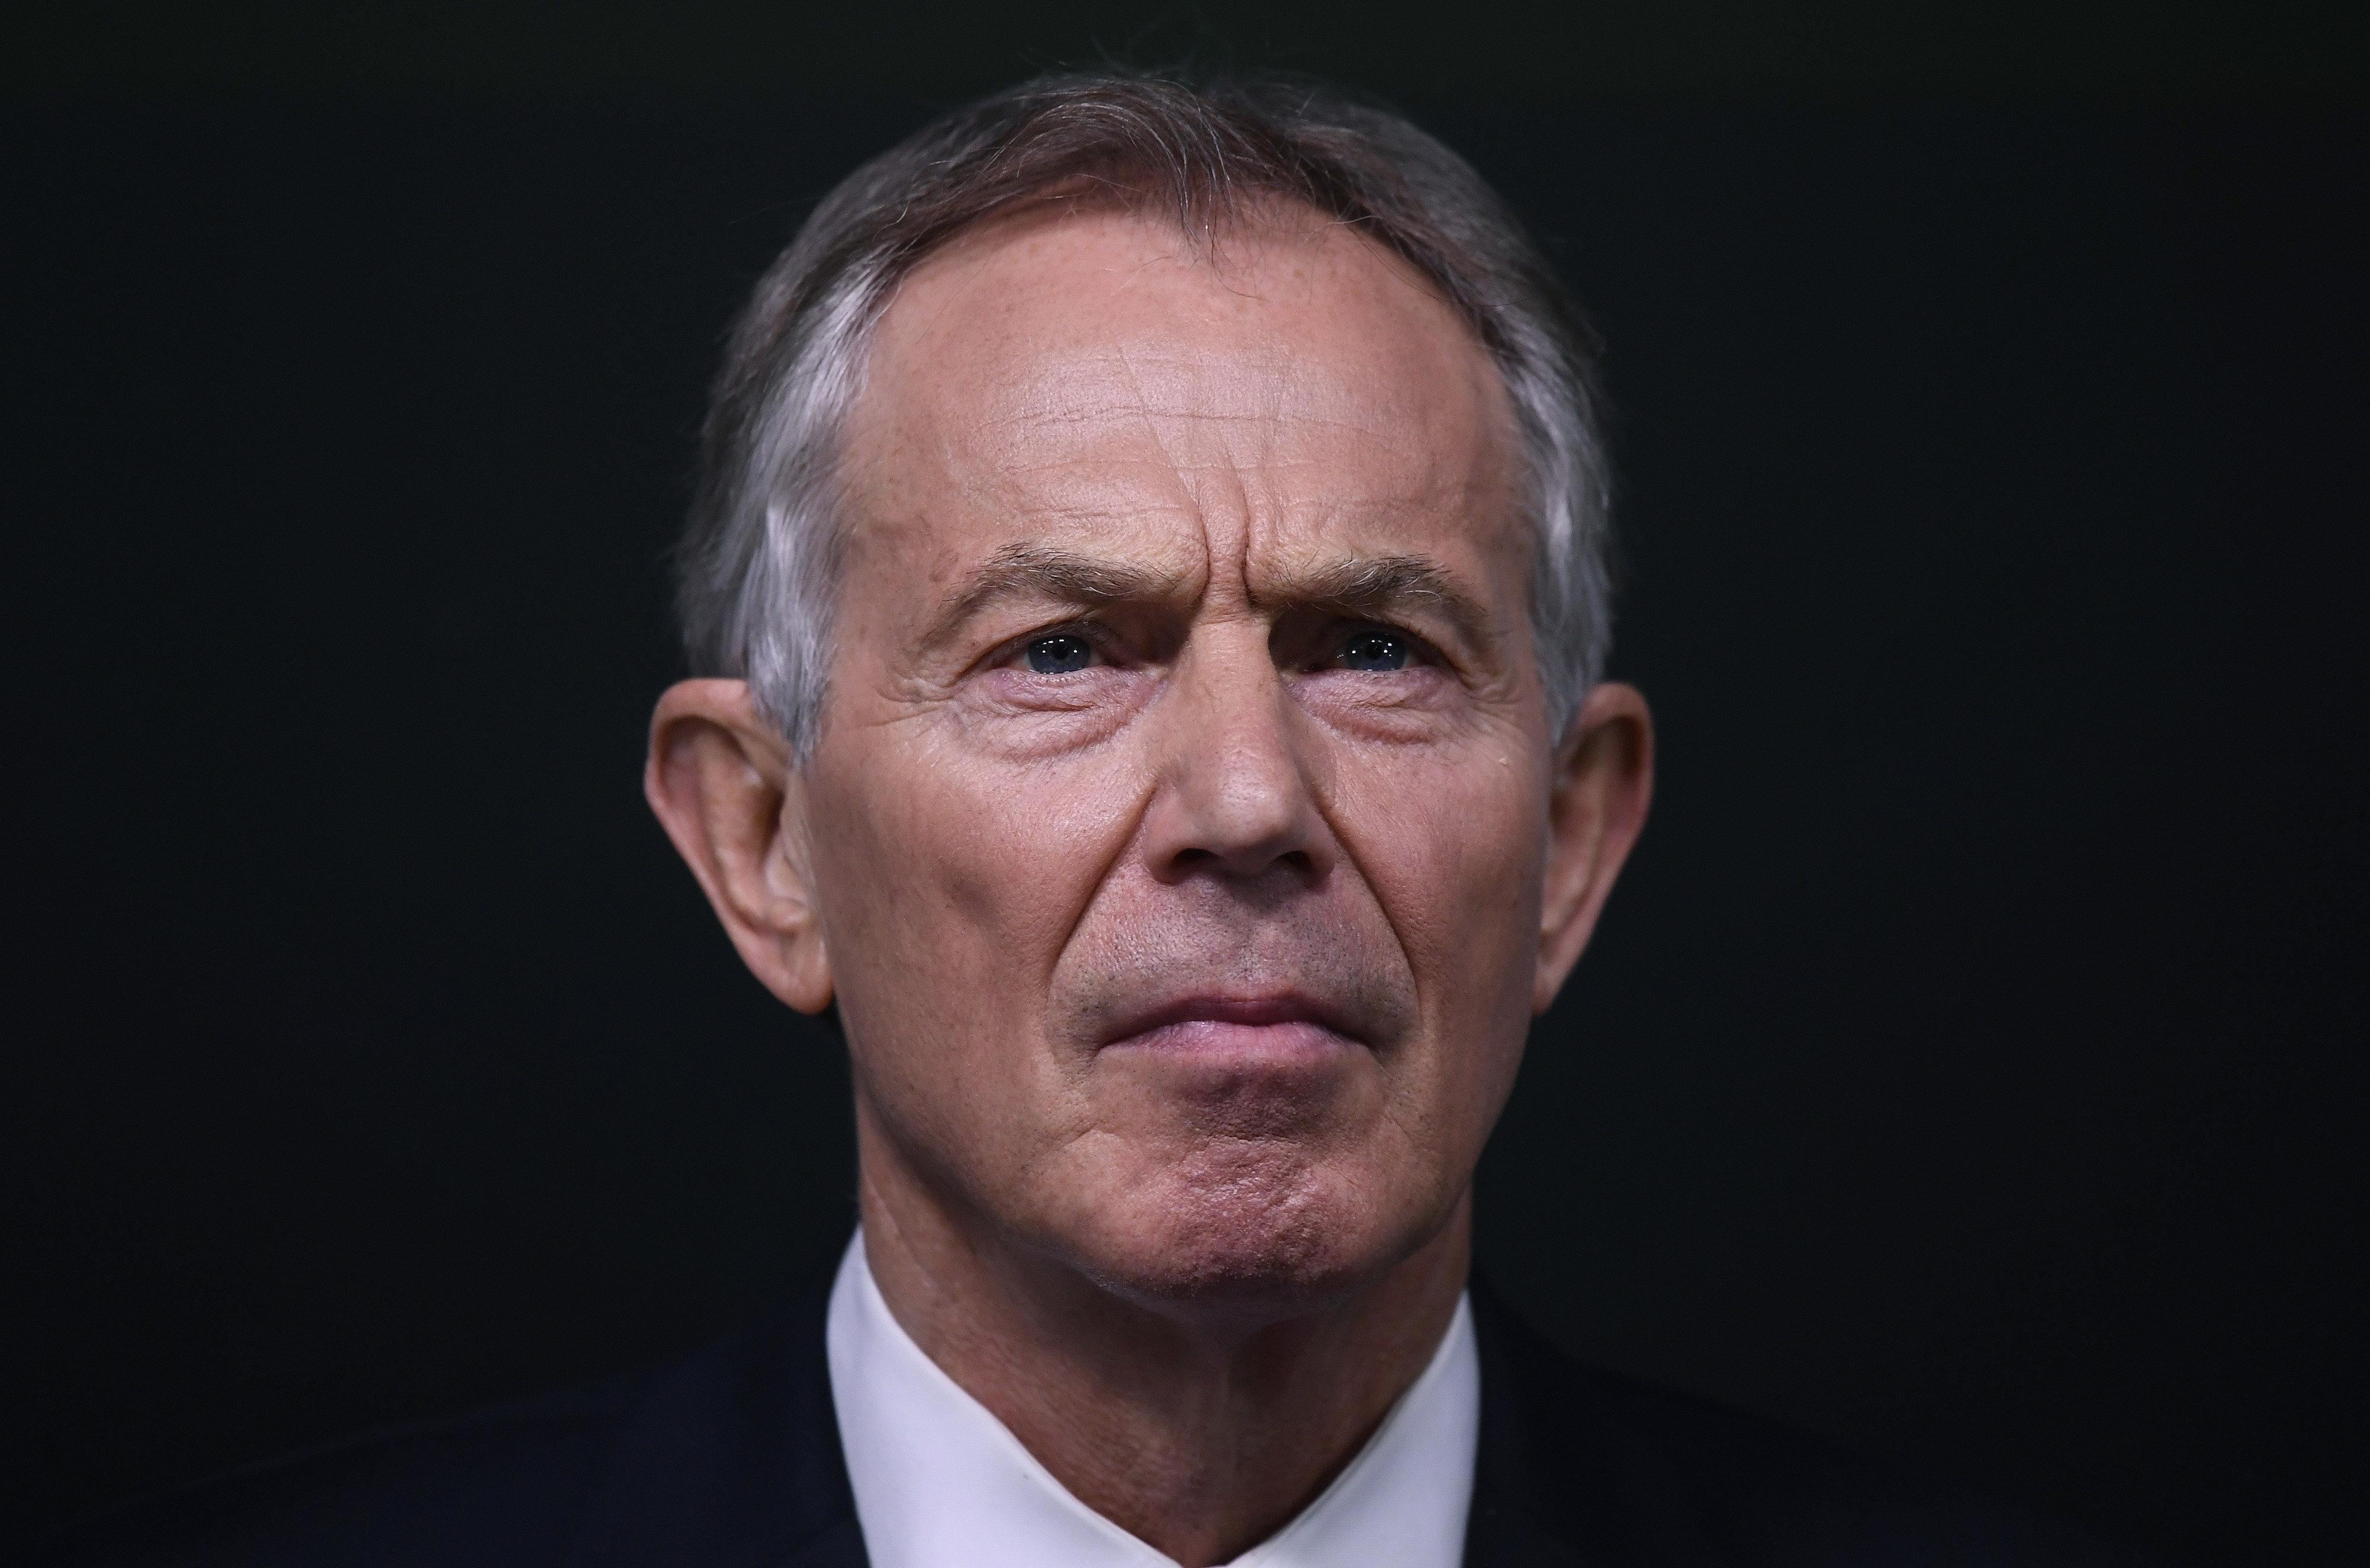 Michael Wolff Brands Tony Blair A 'Complete Liar' Over Trump Job